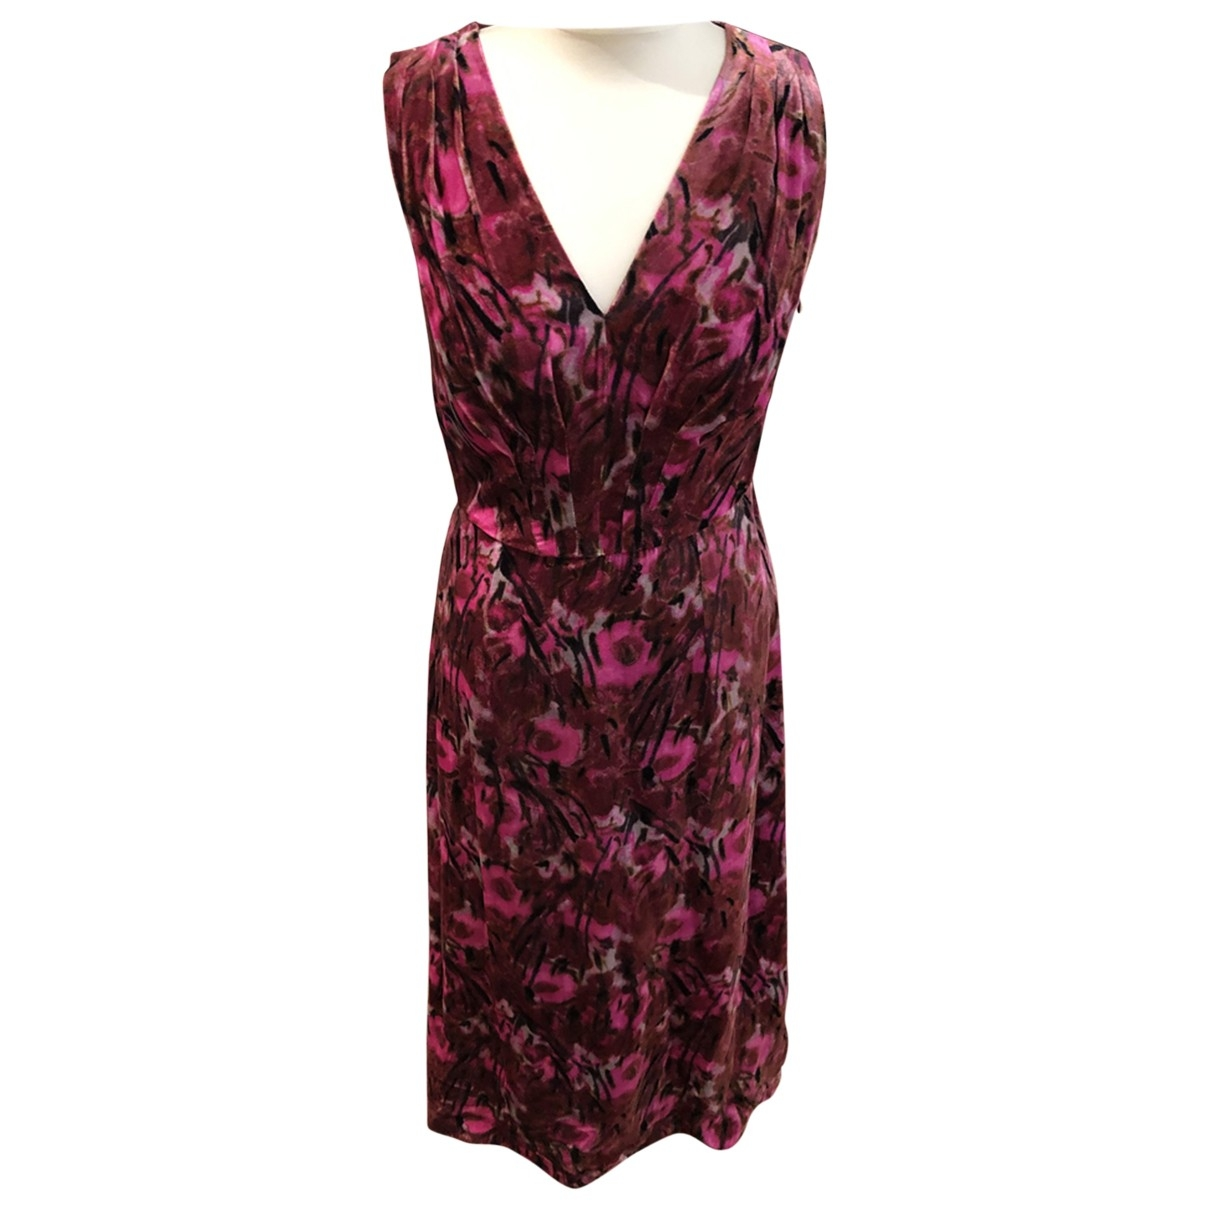 Prada \N Multicolour dress for Women 40 IT